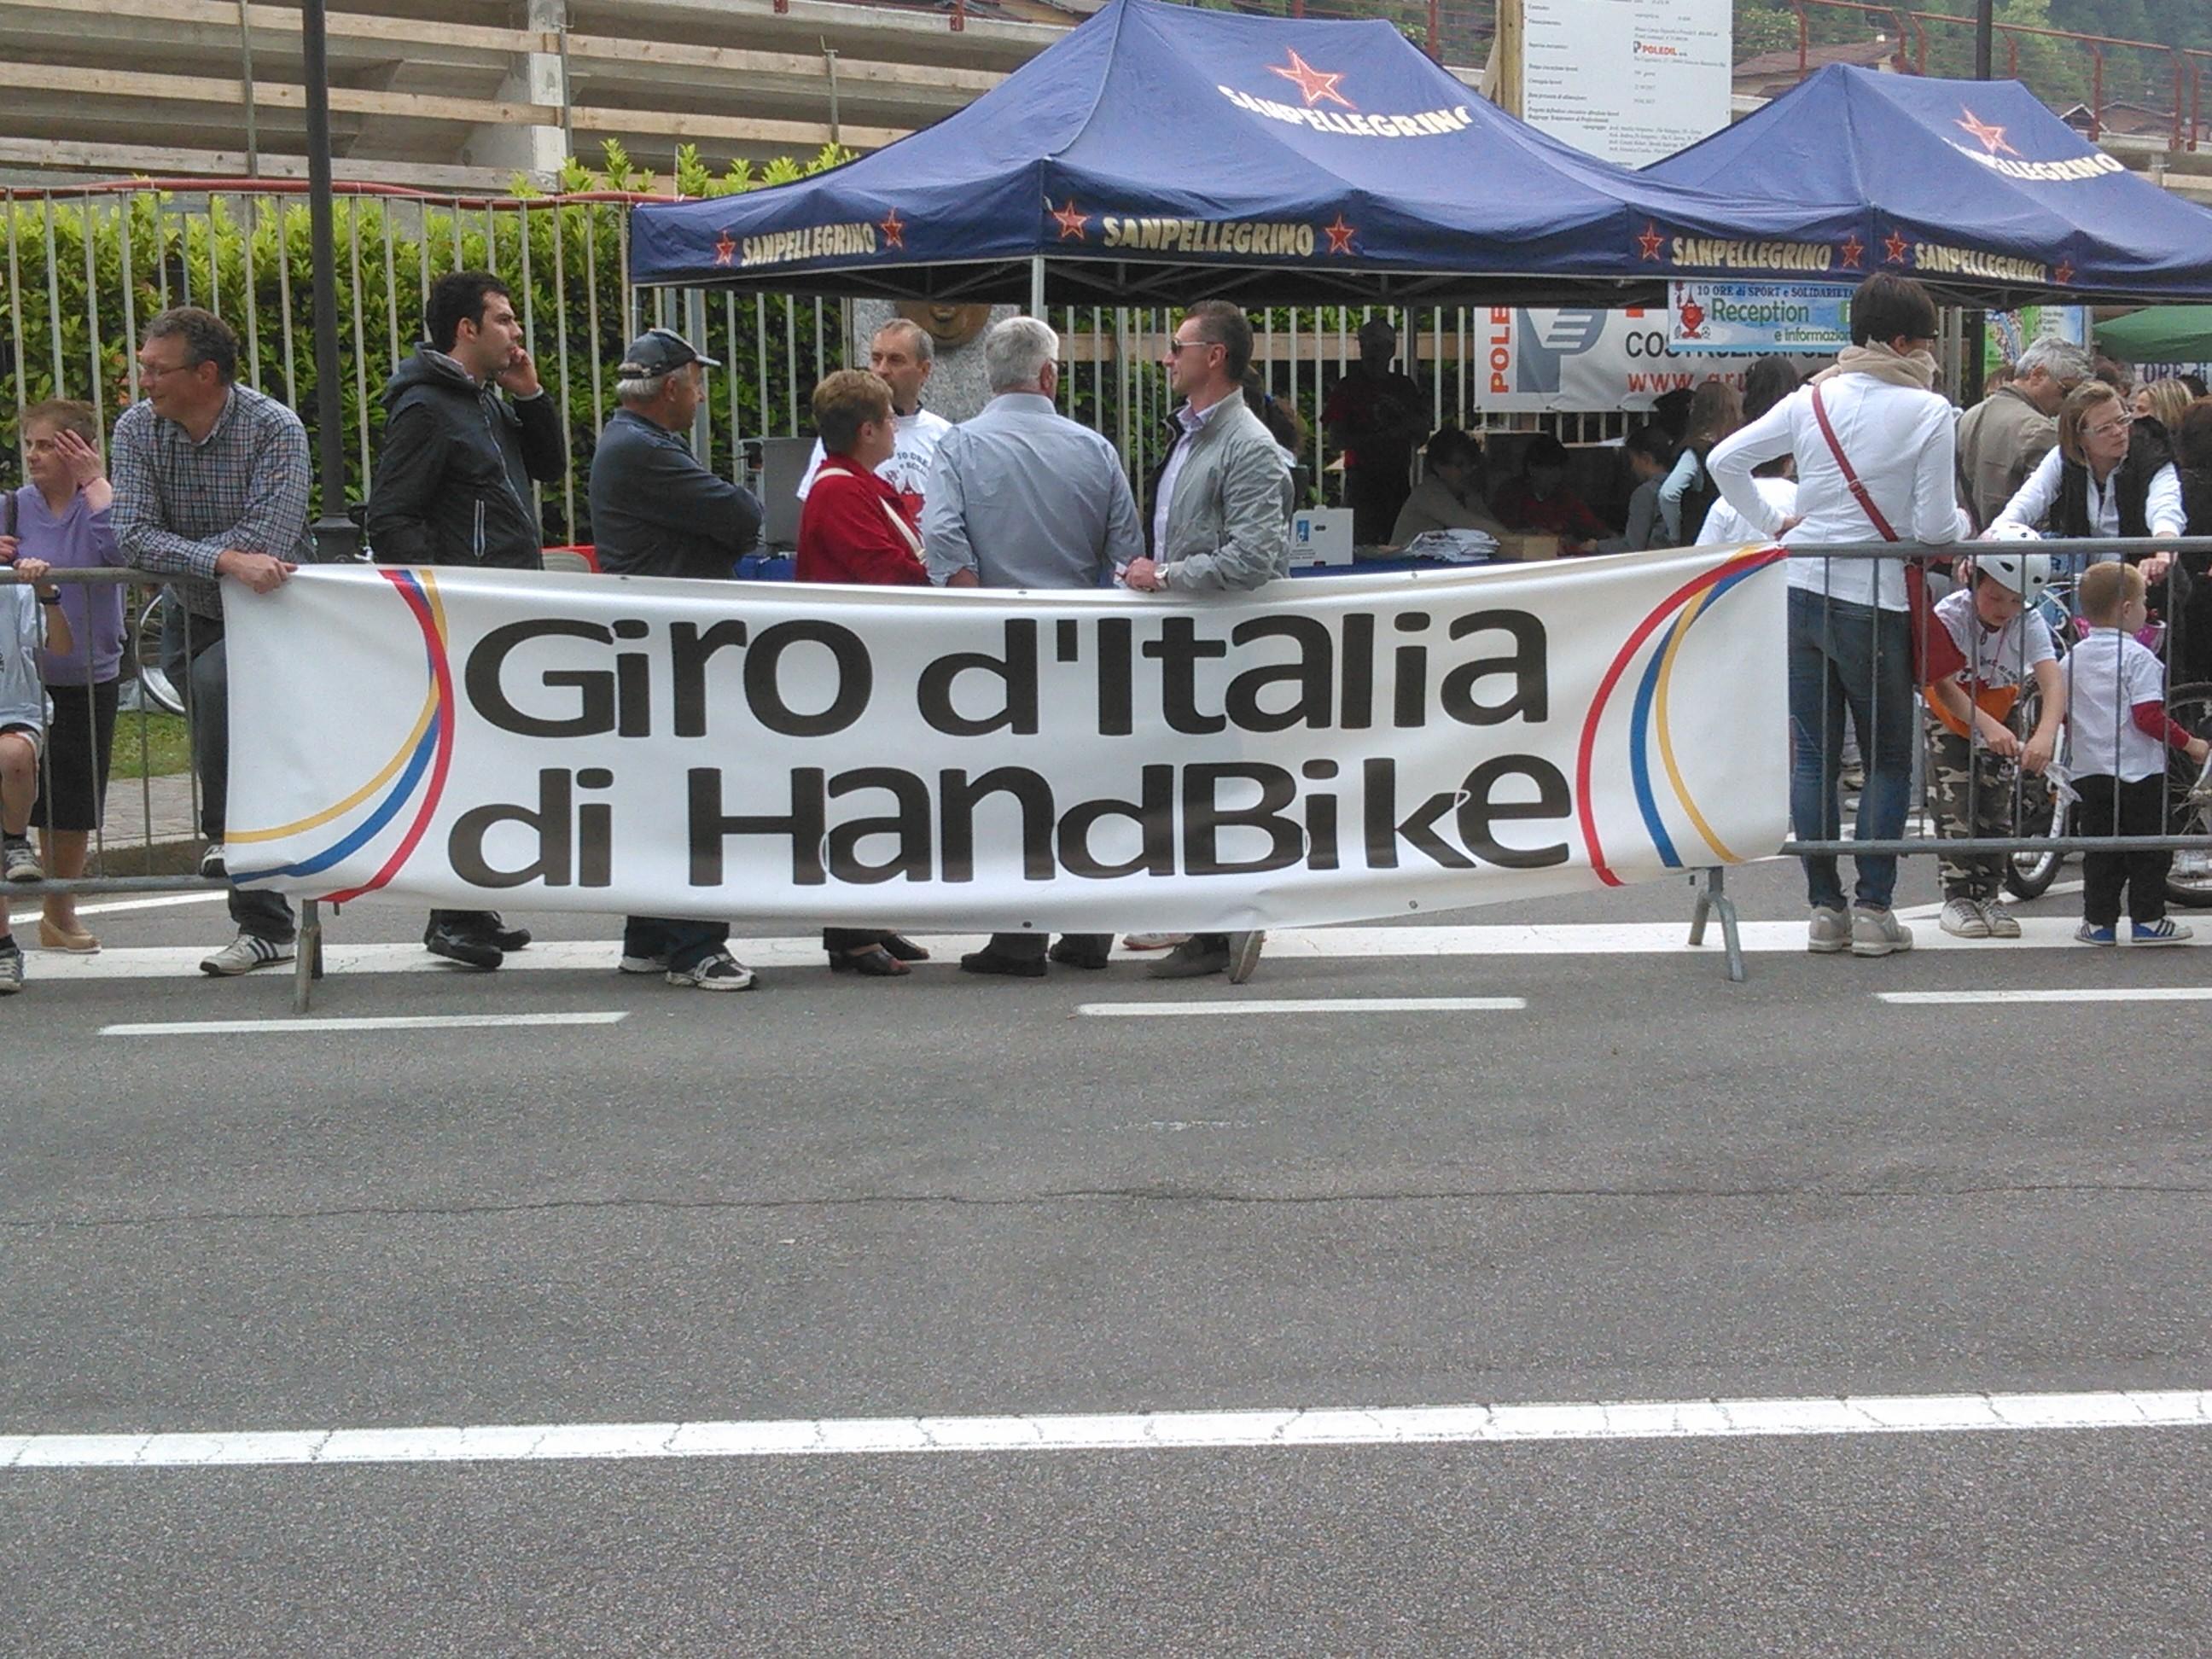 Giro d'Italia #Handbike - 1.06.2013 - Video